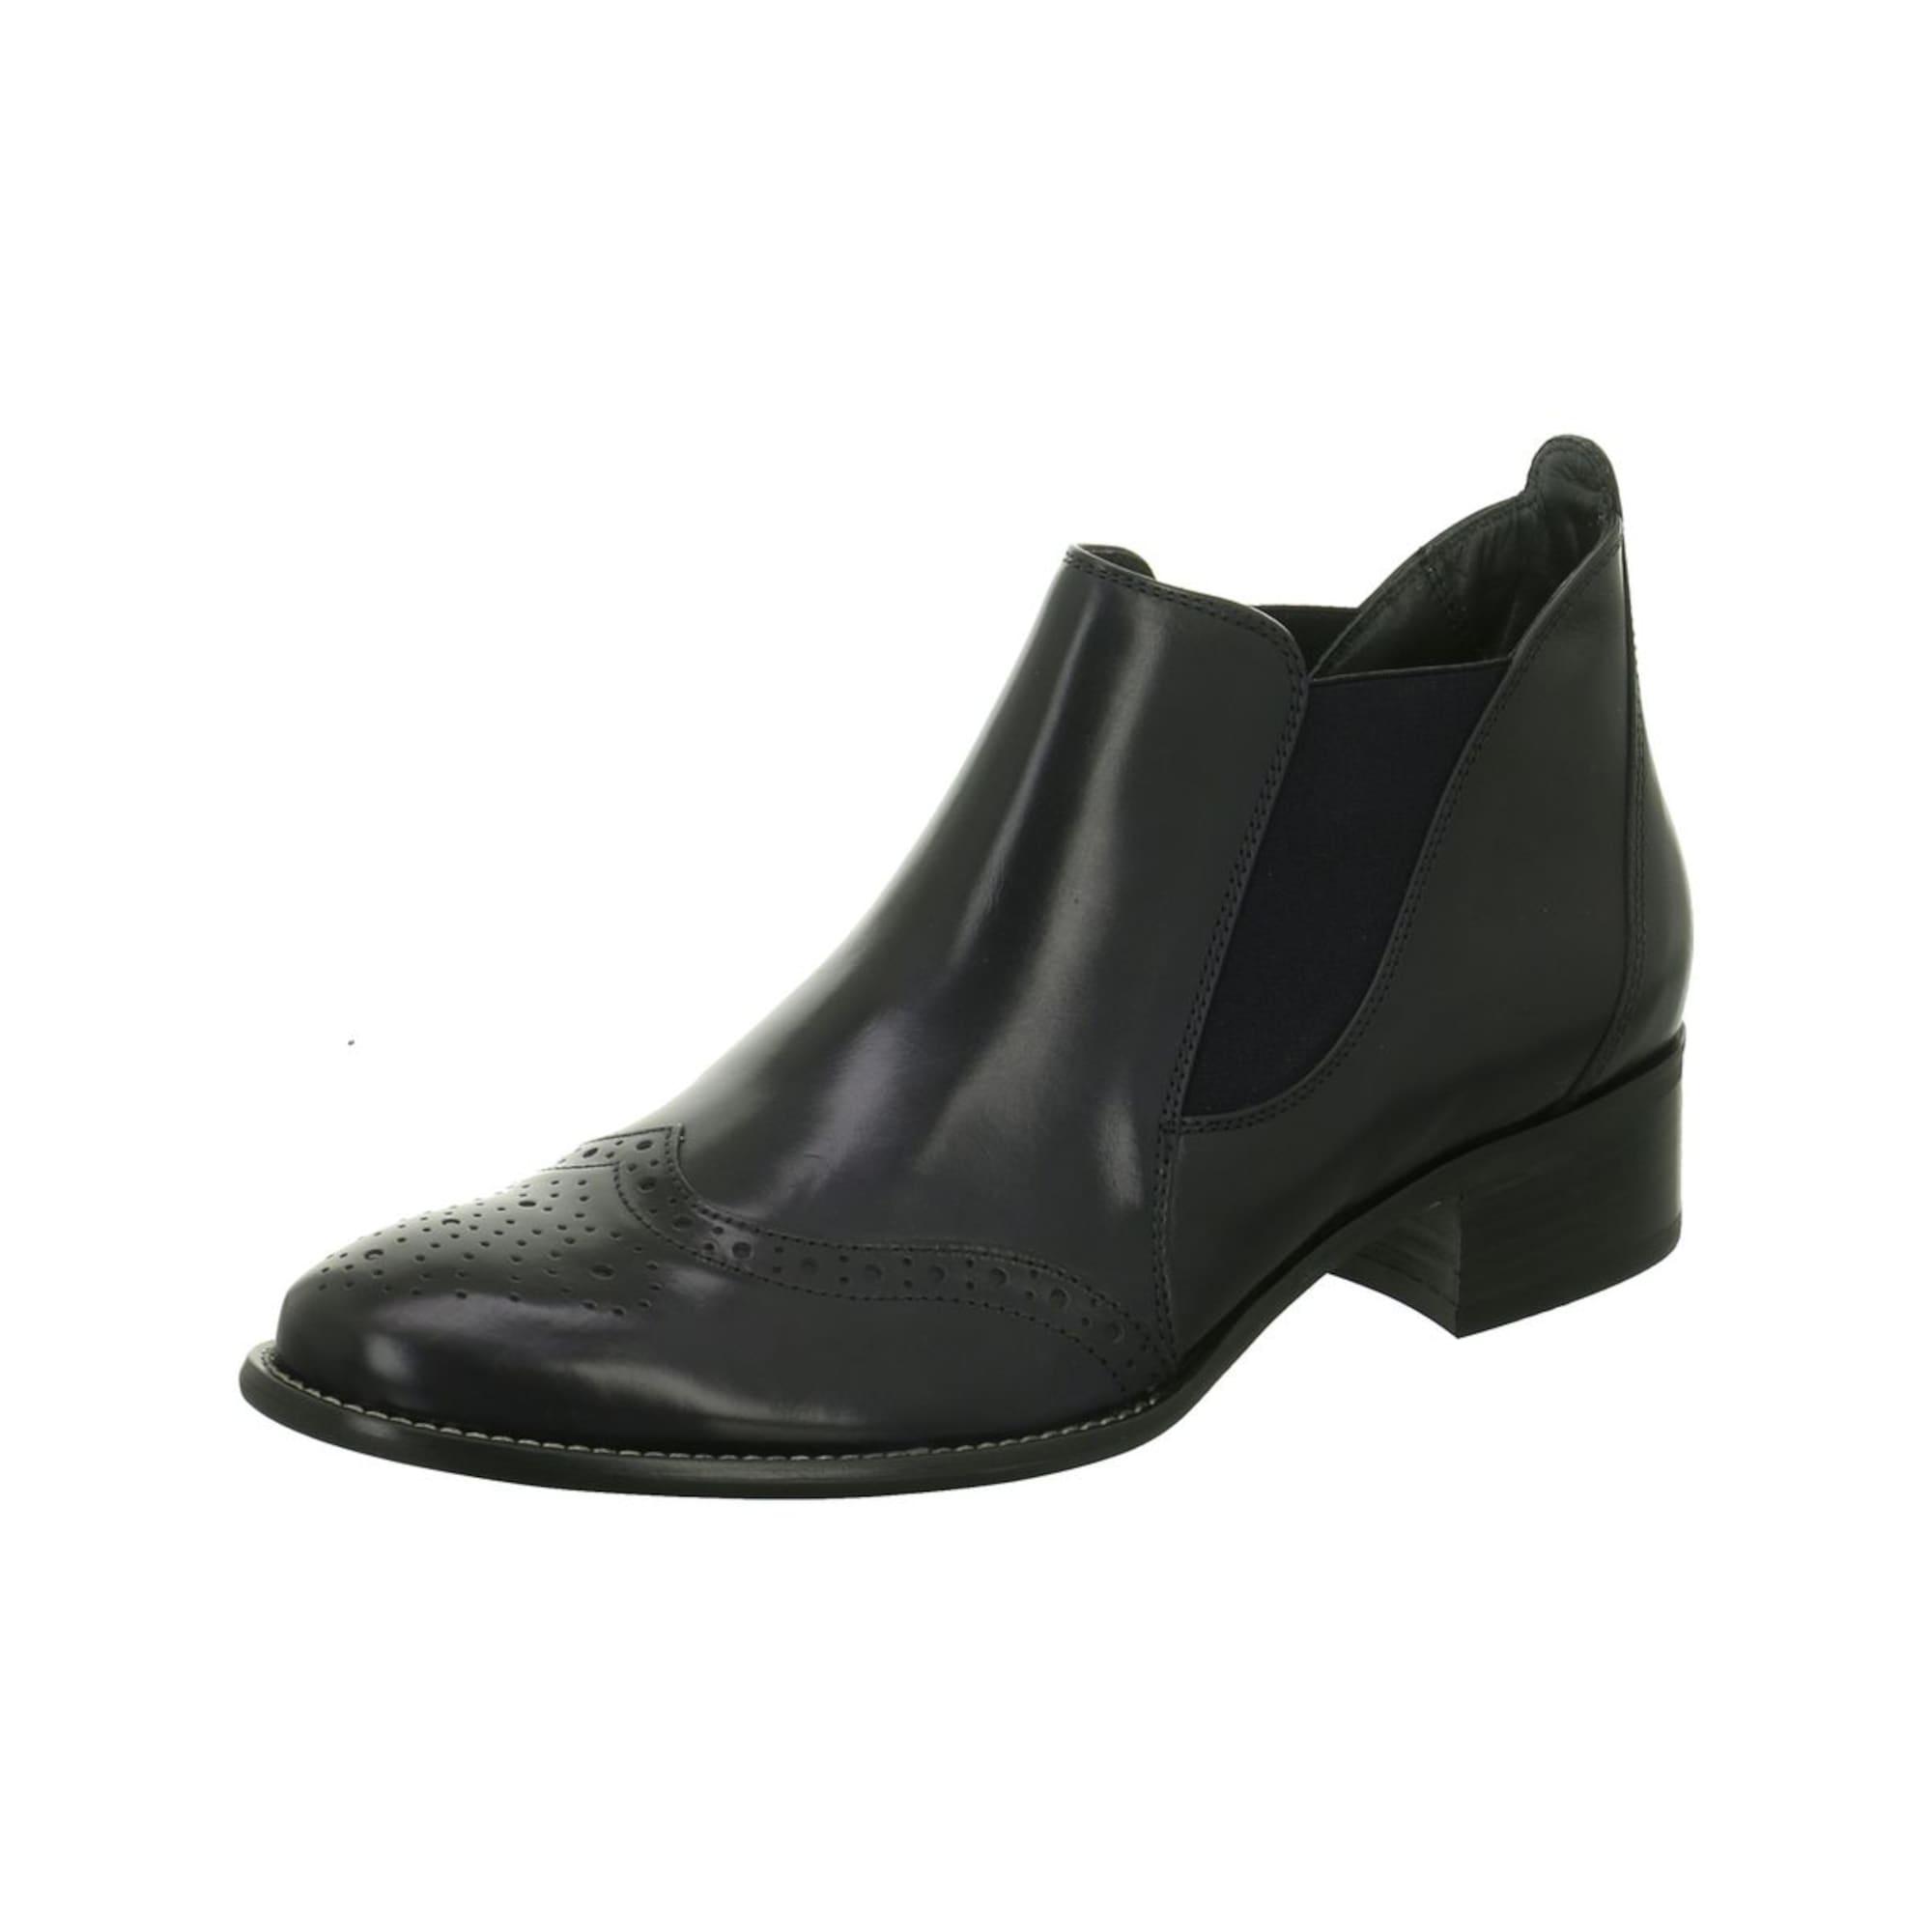 Stiefel   Schuhe > Stiefel   Paul Green